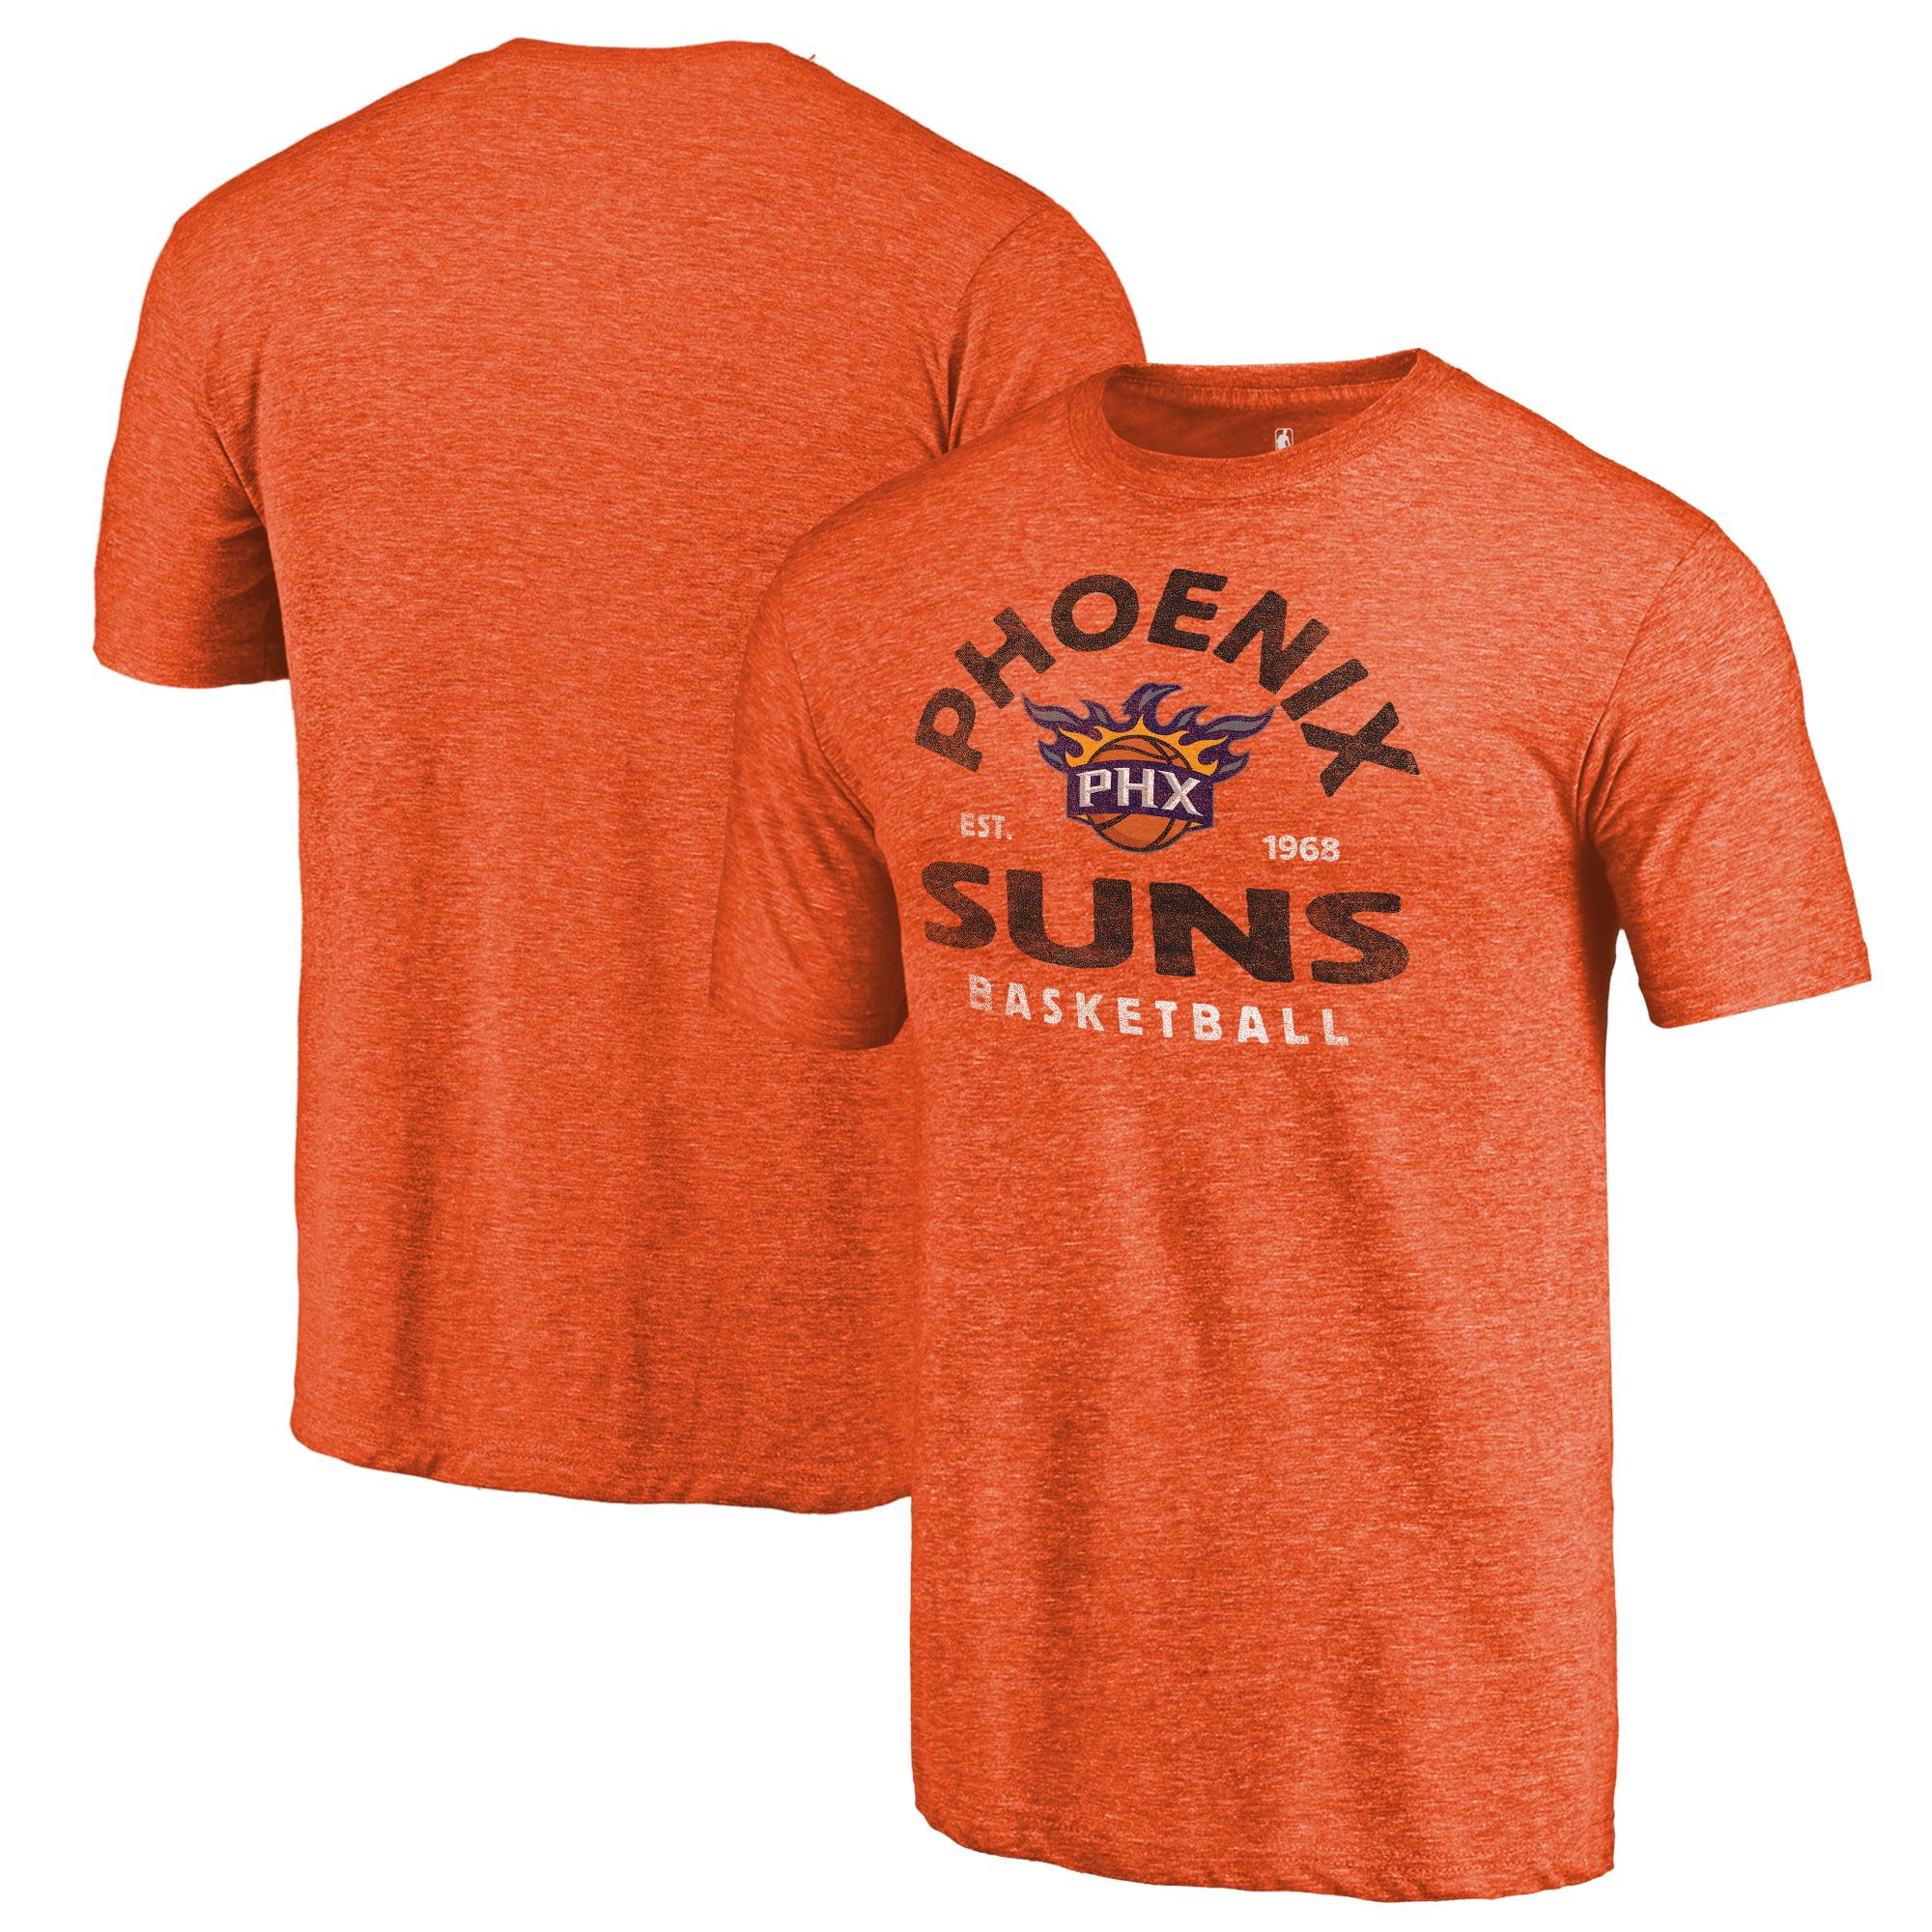 Phoenix Suns Fanatics Branded Vintage Arch Tri-Blend T-Shirt - Orange